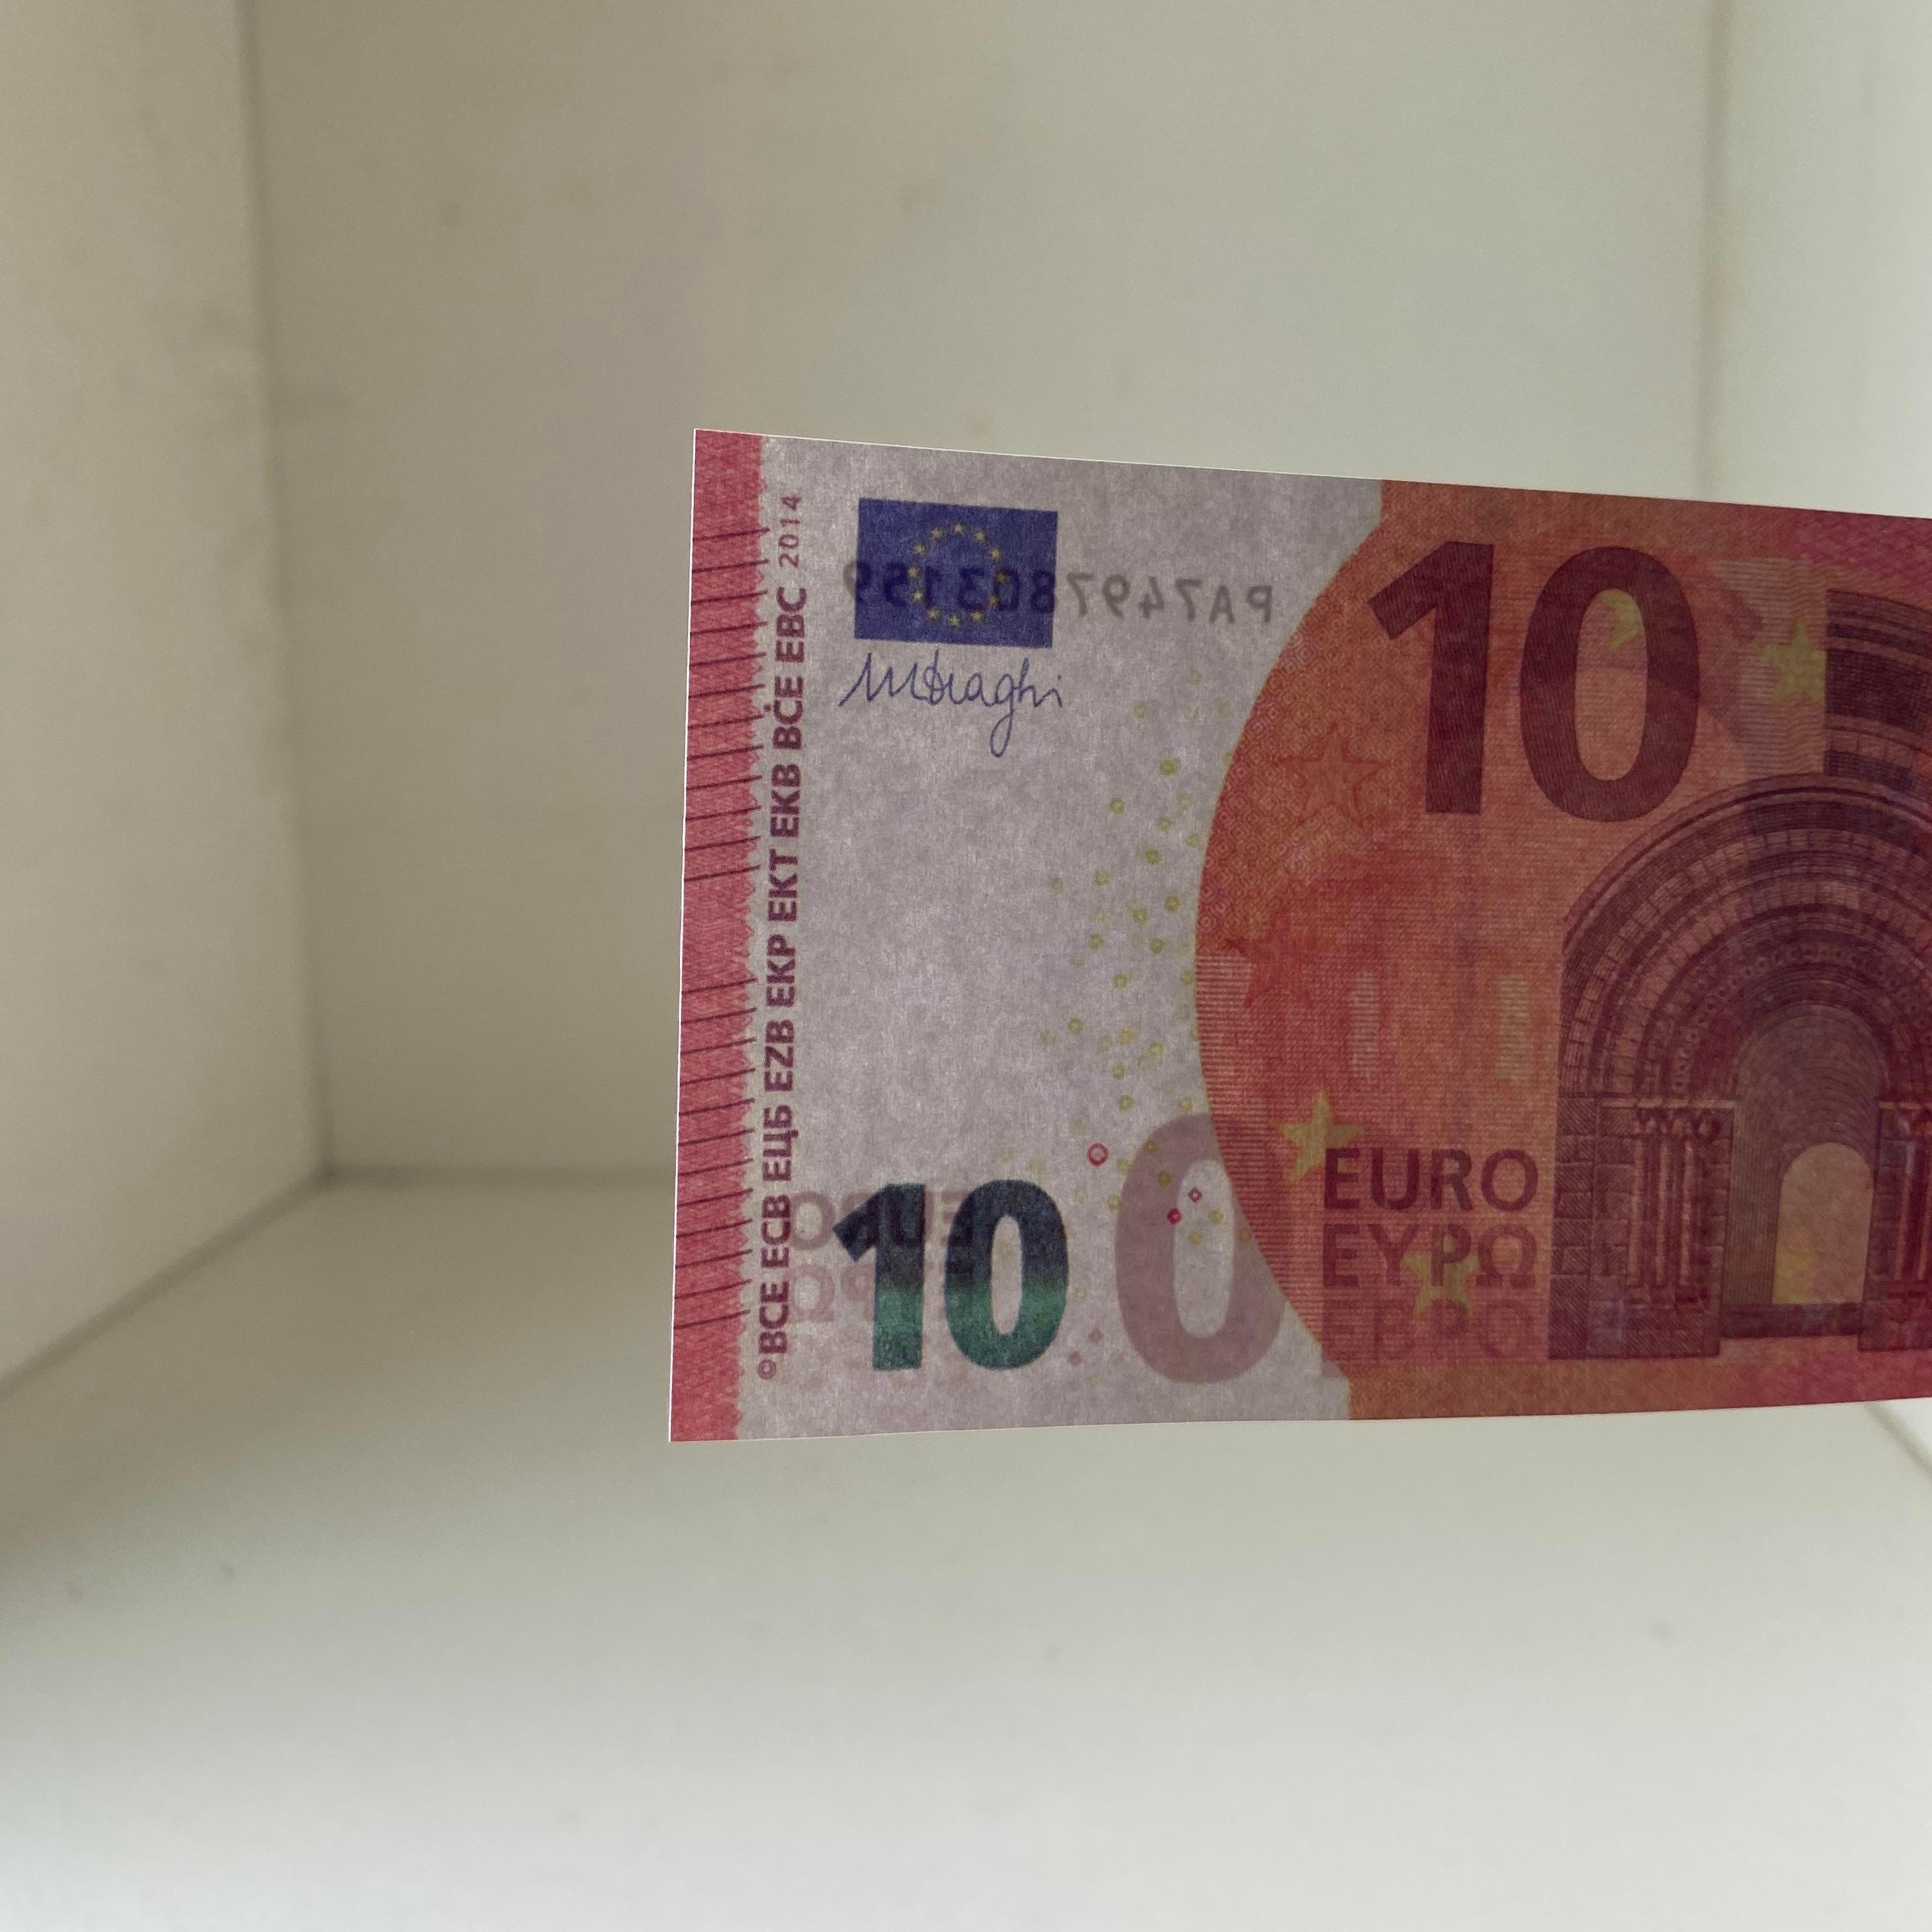 000 Nightclub Money High Play e Euro Puntelli Falso denaro denaro Bar Billet Movie Billet Faux Falso Euro Qualità Qualità Pretend Collezione 10 Regalo DPBU